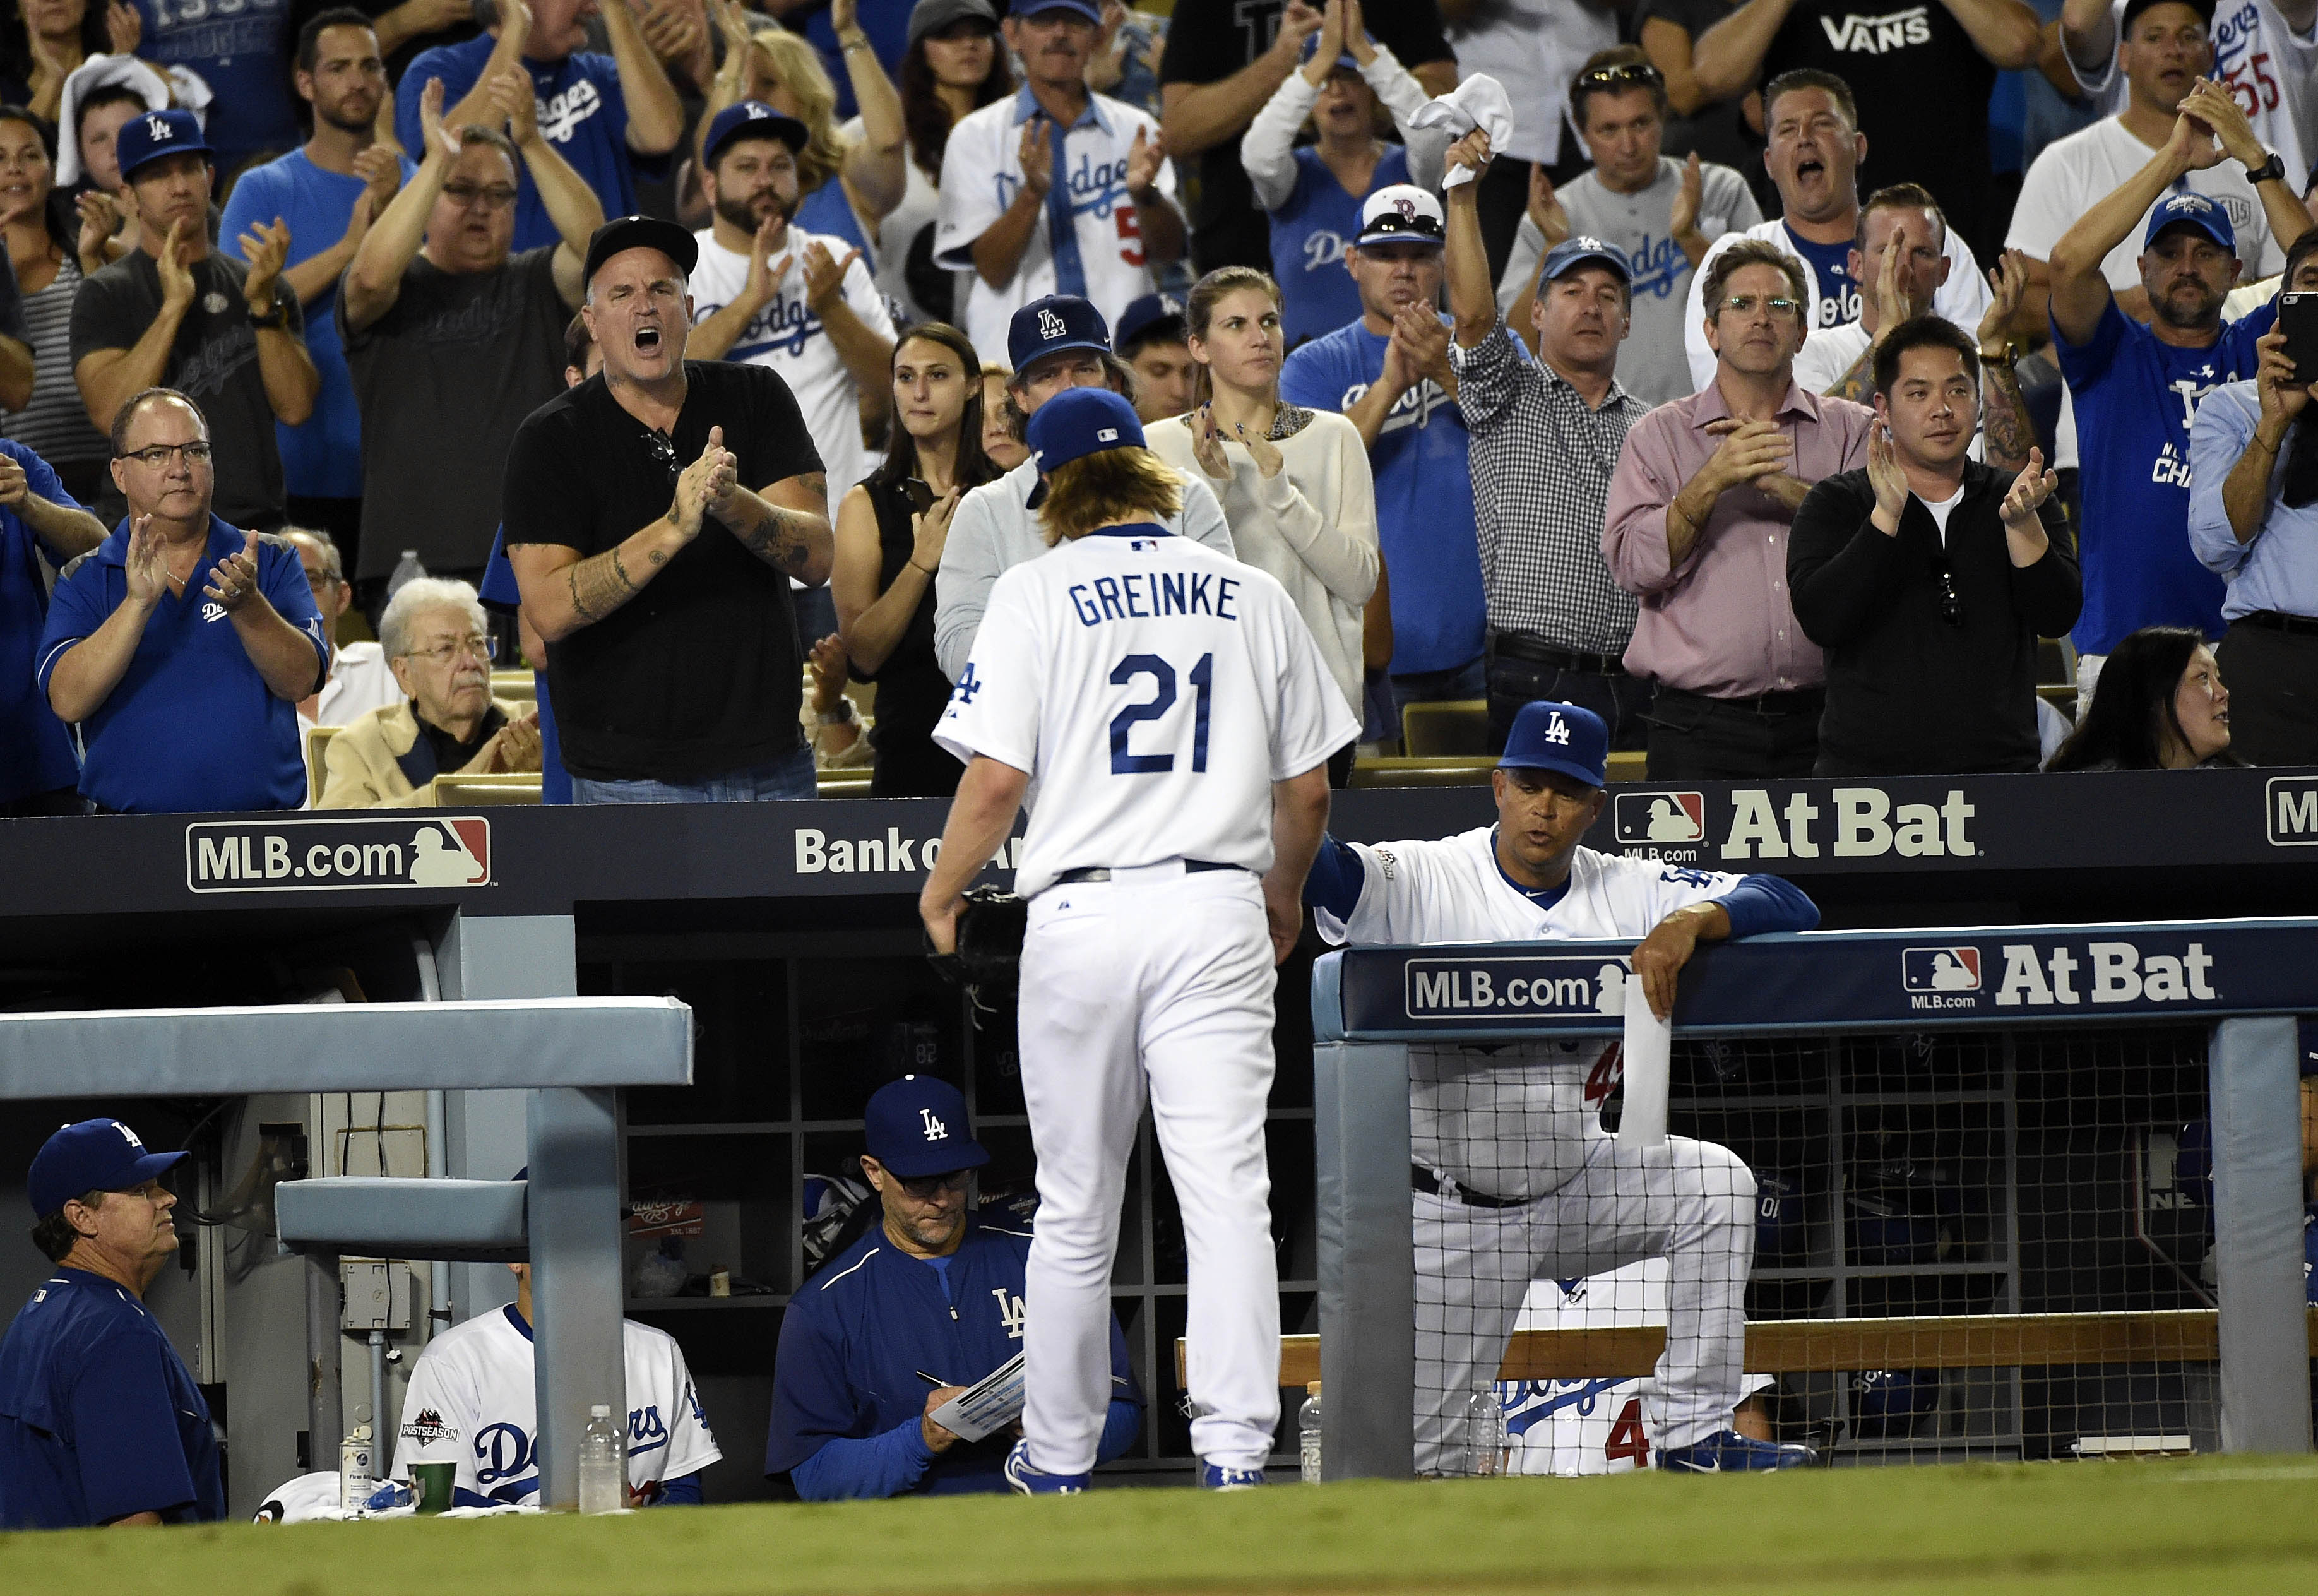 Zack Greinke's 1.66 ERA didn't win the Cy Young Award - how unusual is it?